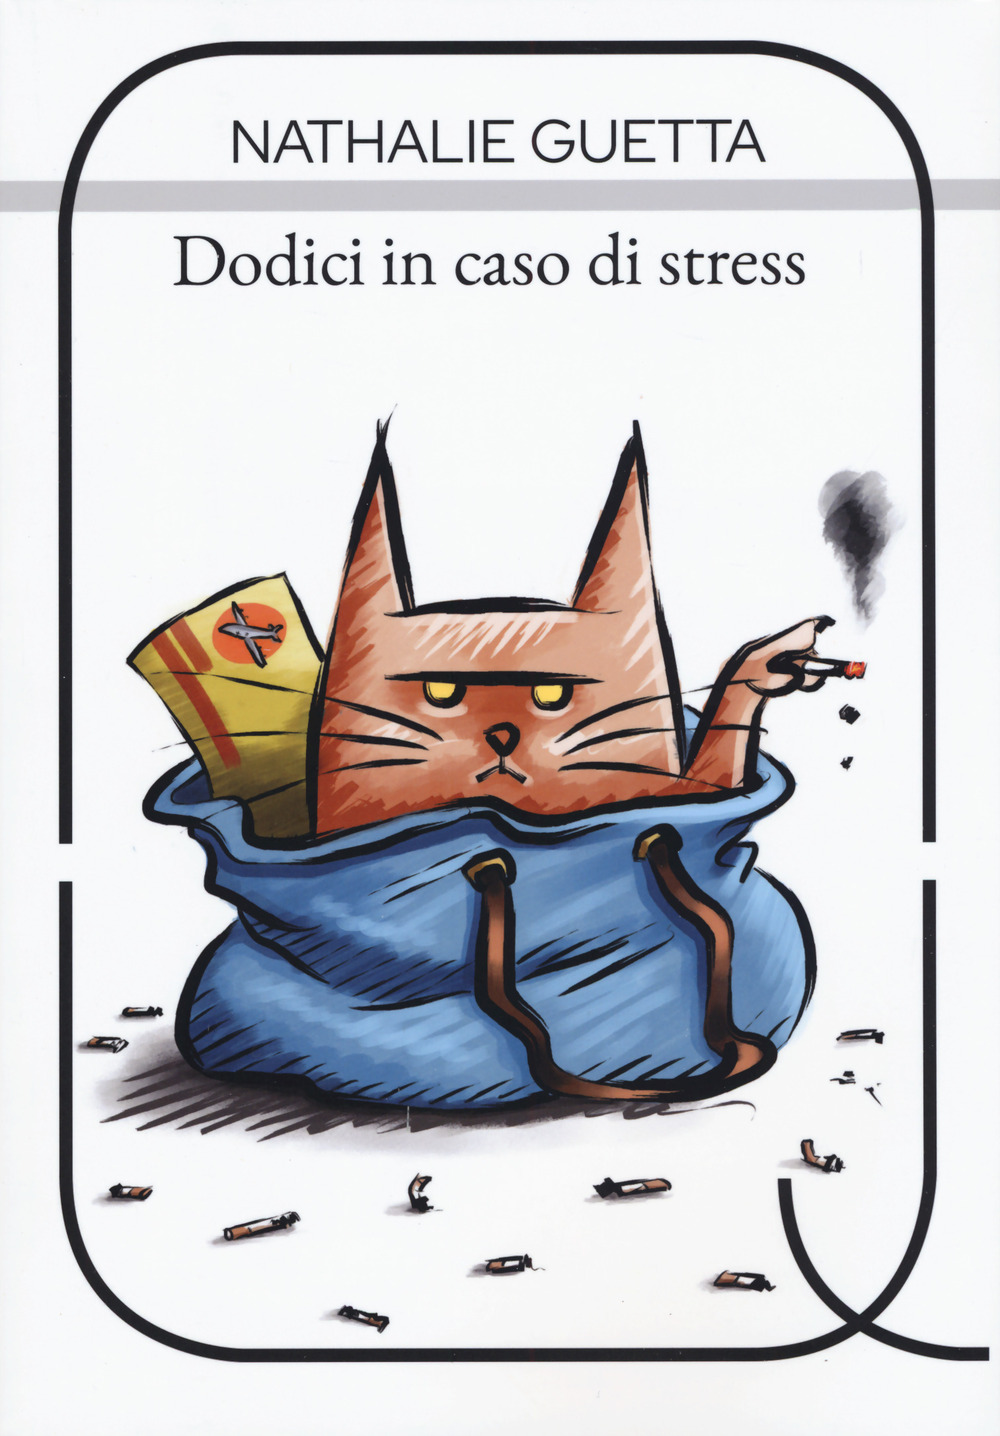 DODICI IN CASO DI STRESS - Guetta Nathalie - 9788832218121